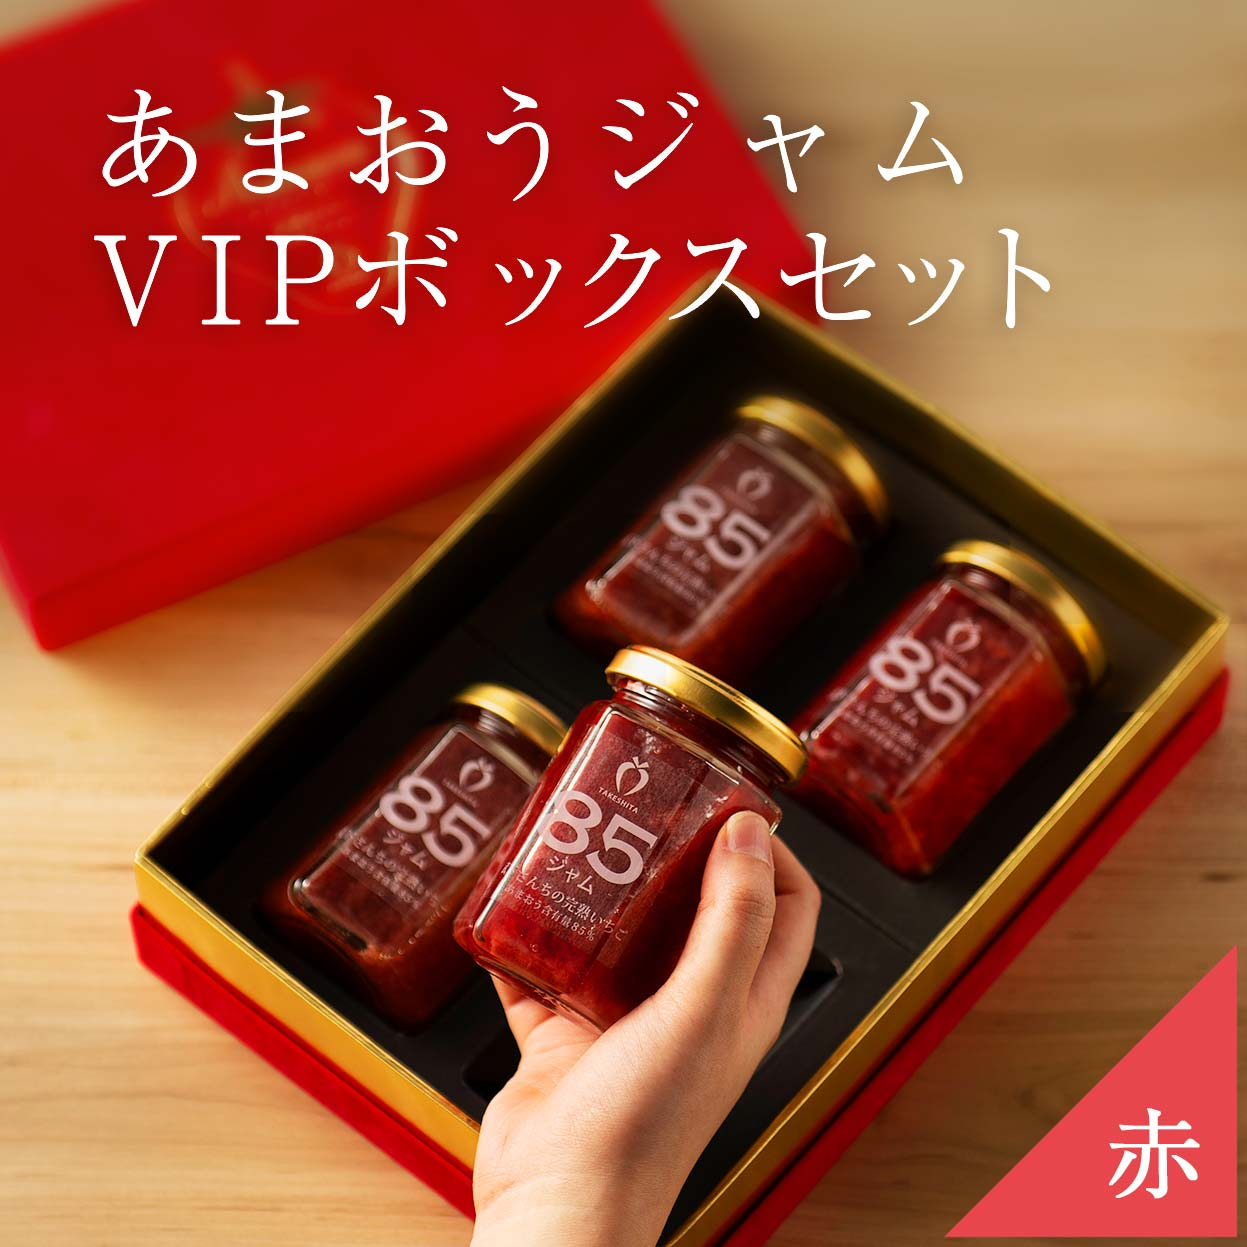 VIPボックス赤 完熟あまおう85%ジャムセット(4瓶入り)